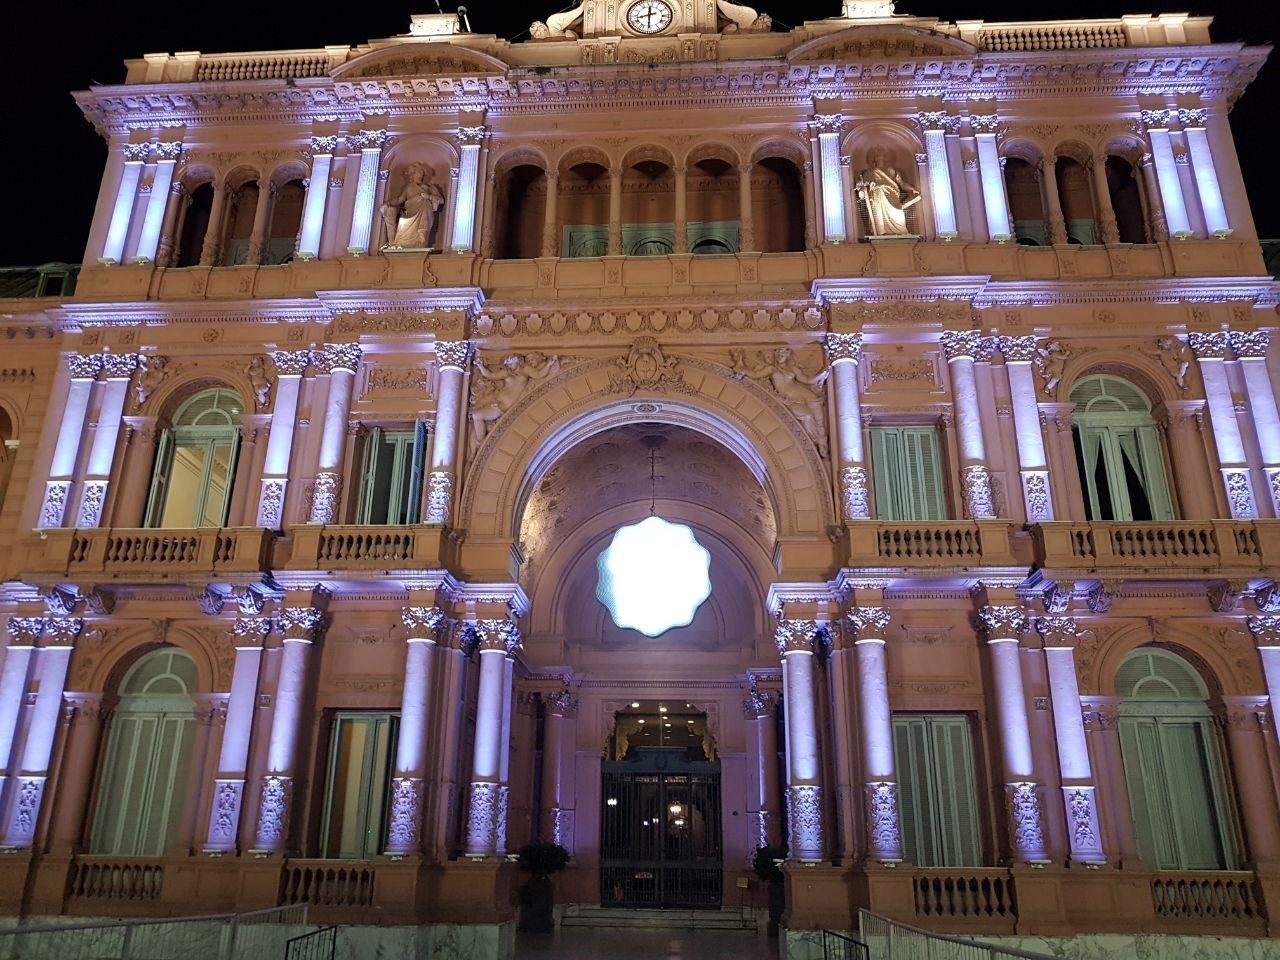 La casa de gobierno brilla con iluminaci n led malalamagna for La casa del led